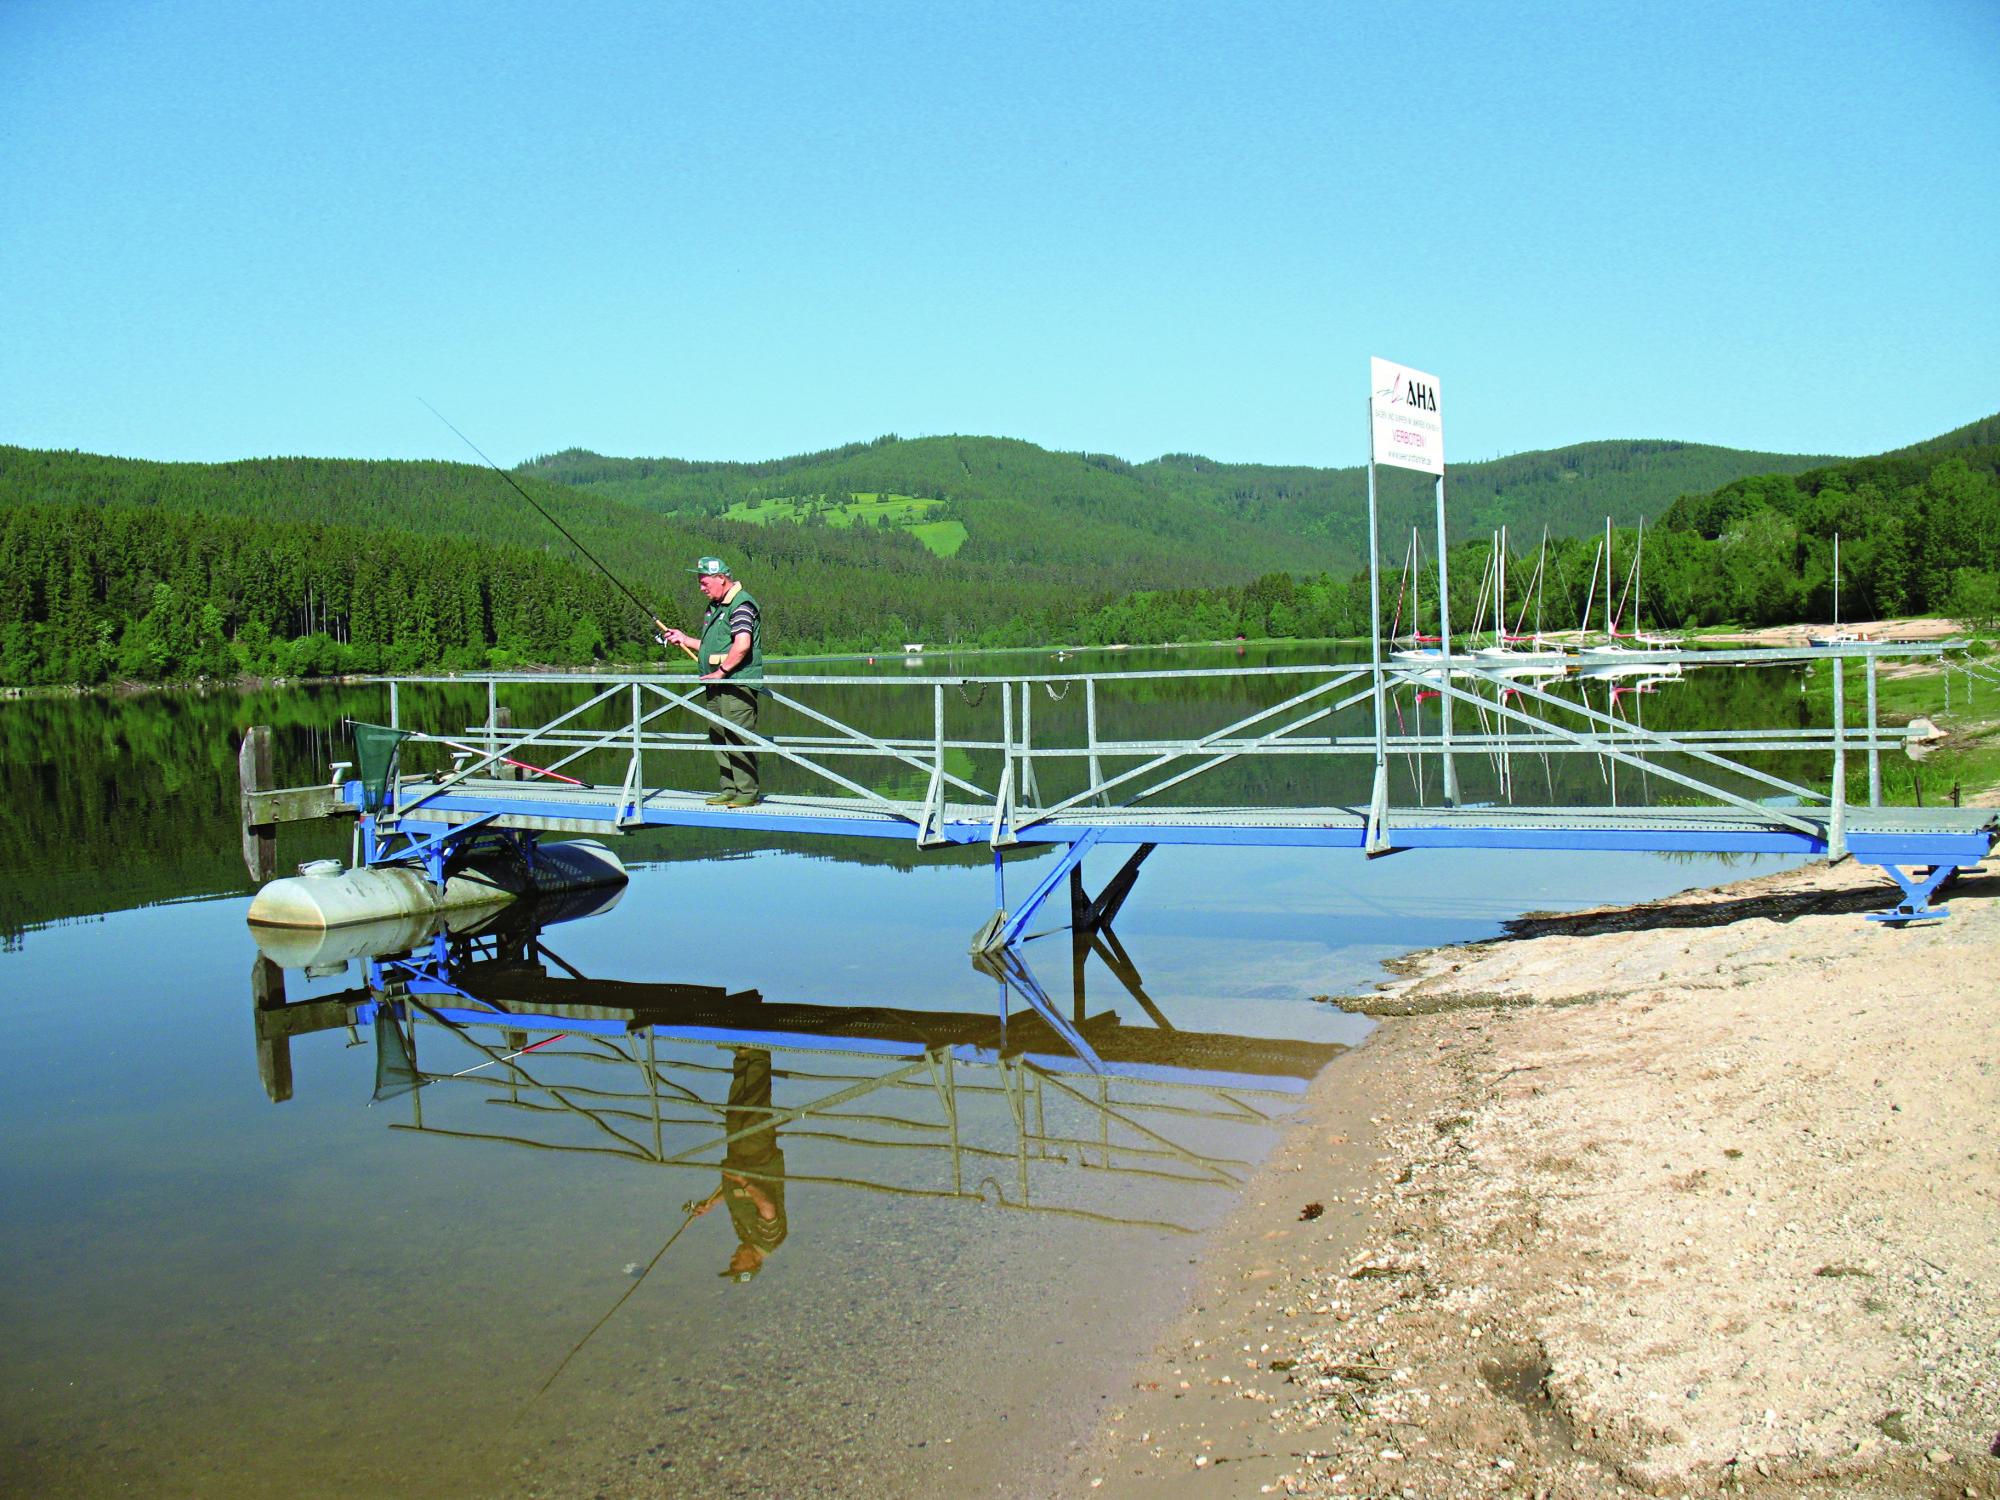 Die Bootsstege der Segelschule in Aha im Nordwesten des See.